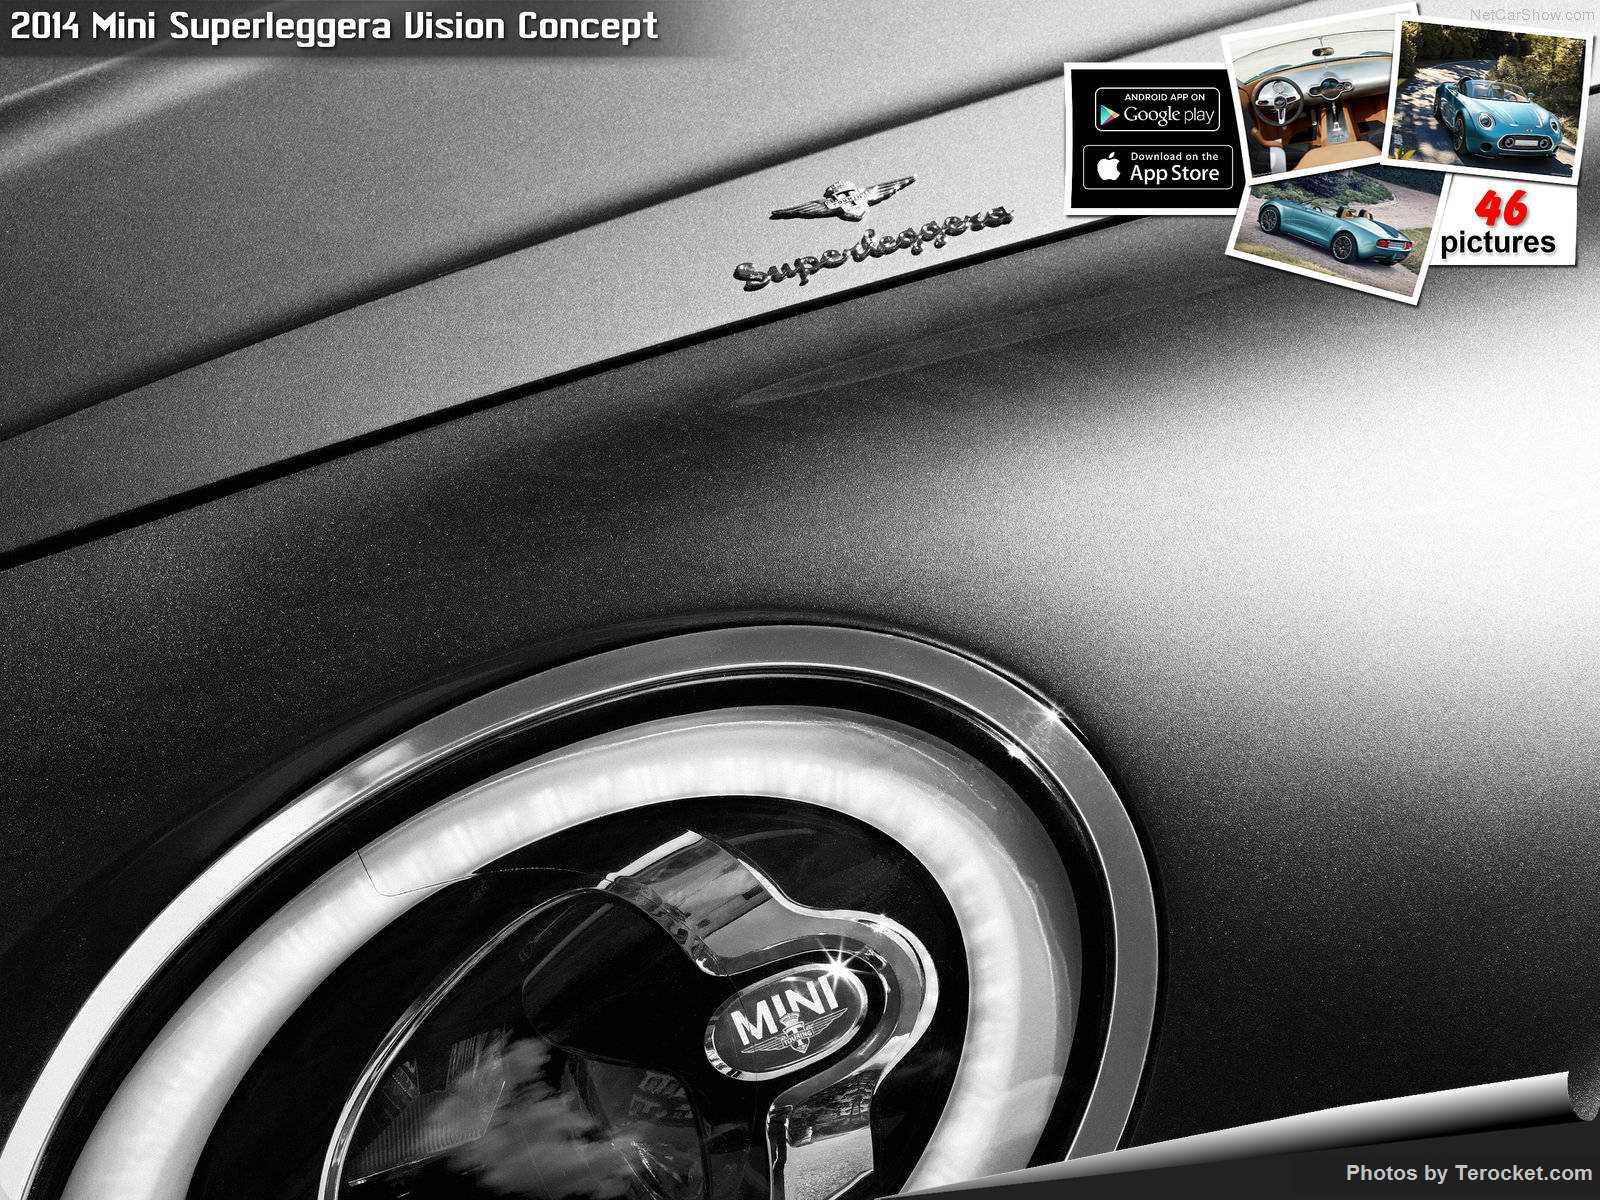 Hình ảnh xe ô tô Mini Superleggera Vision Concept 2014 & nội ngoại thất